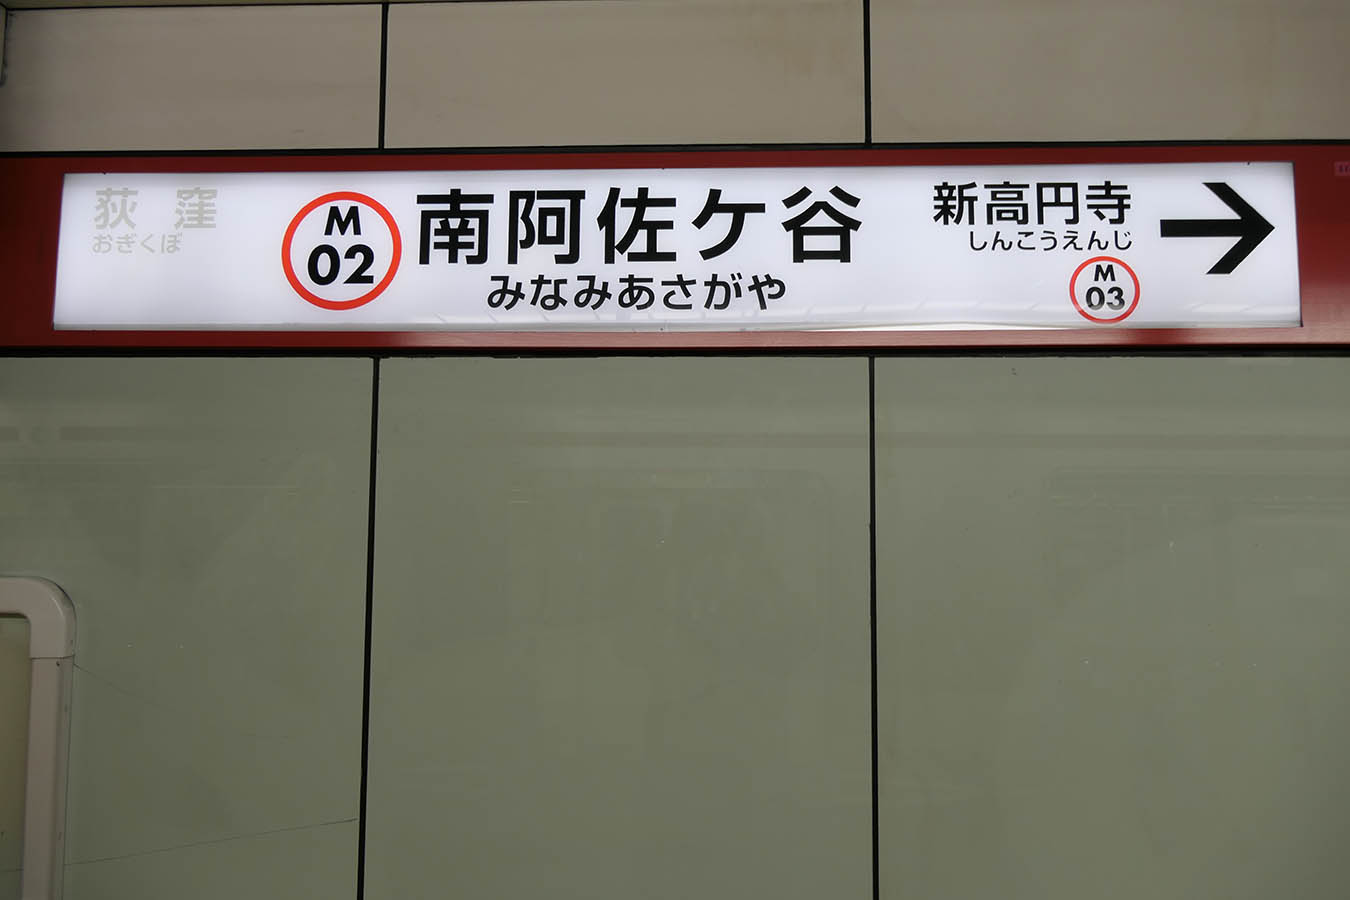 M02_photo04.jpg